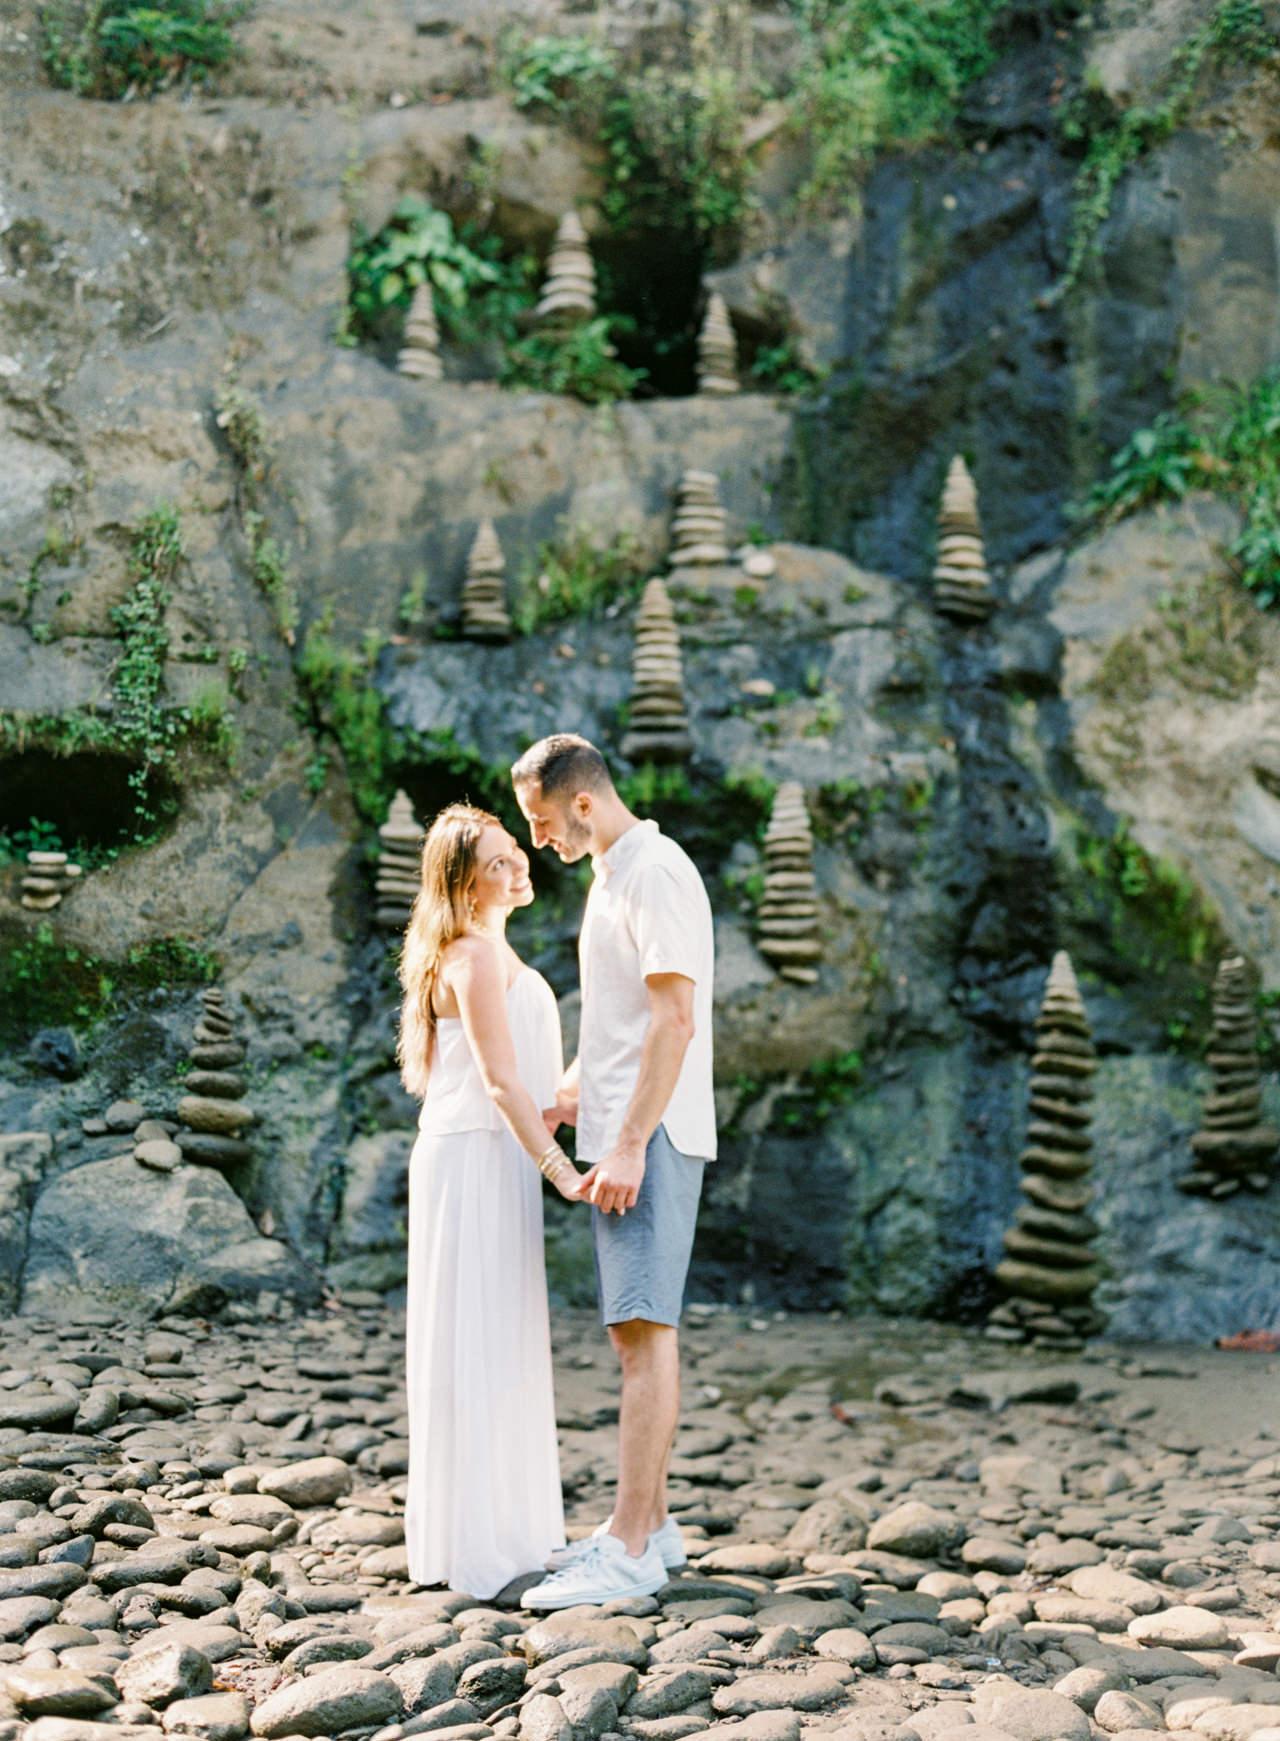 M&N: Intimate Bali Waterfall Photo Session 11